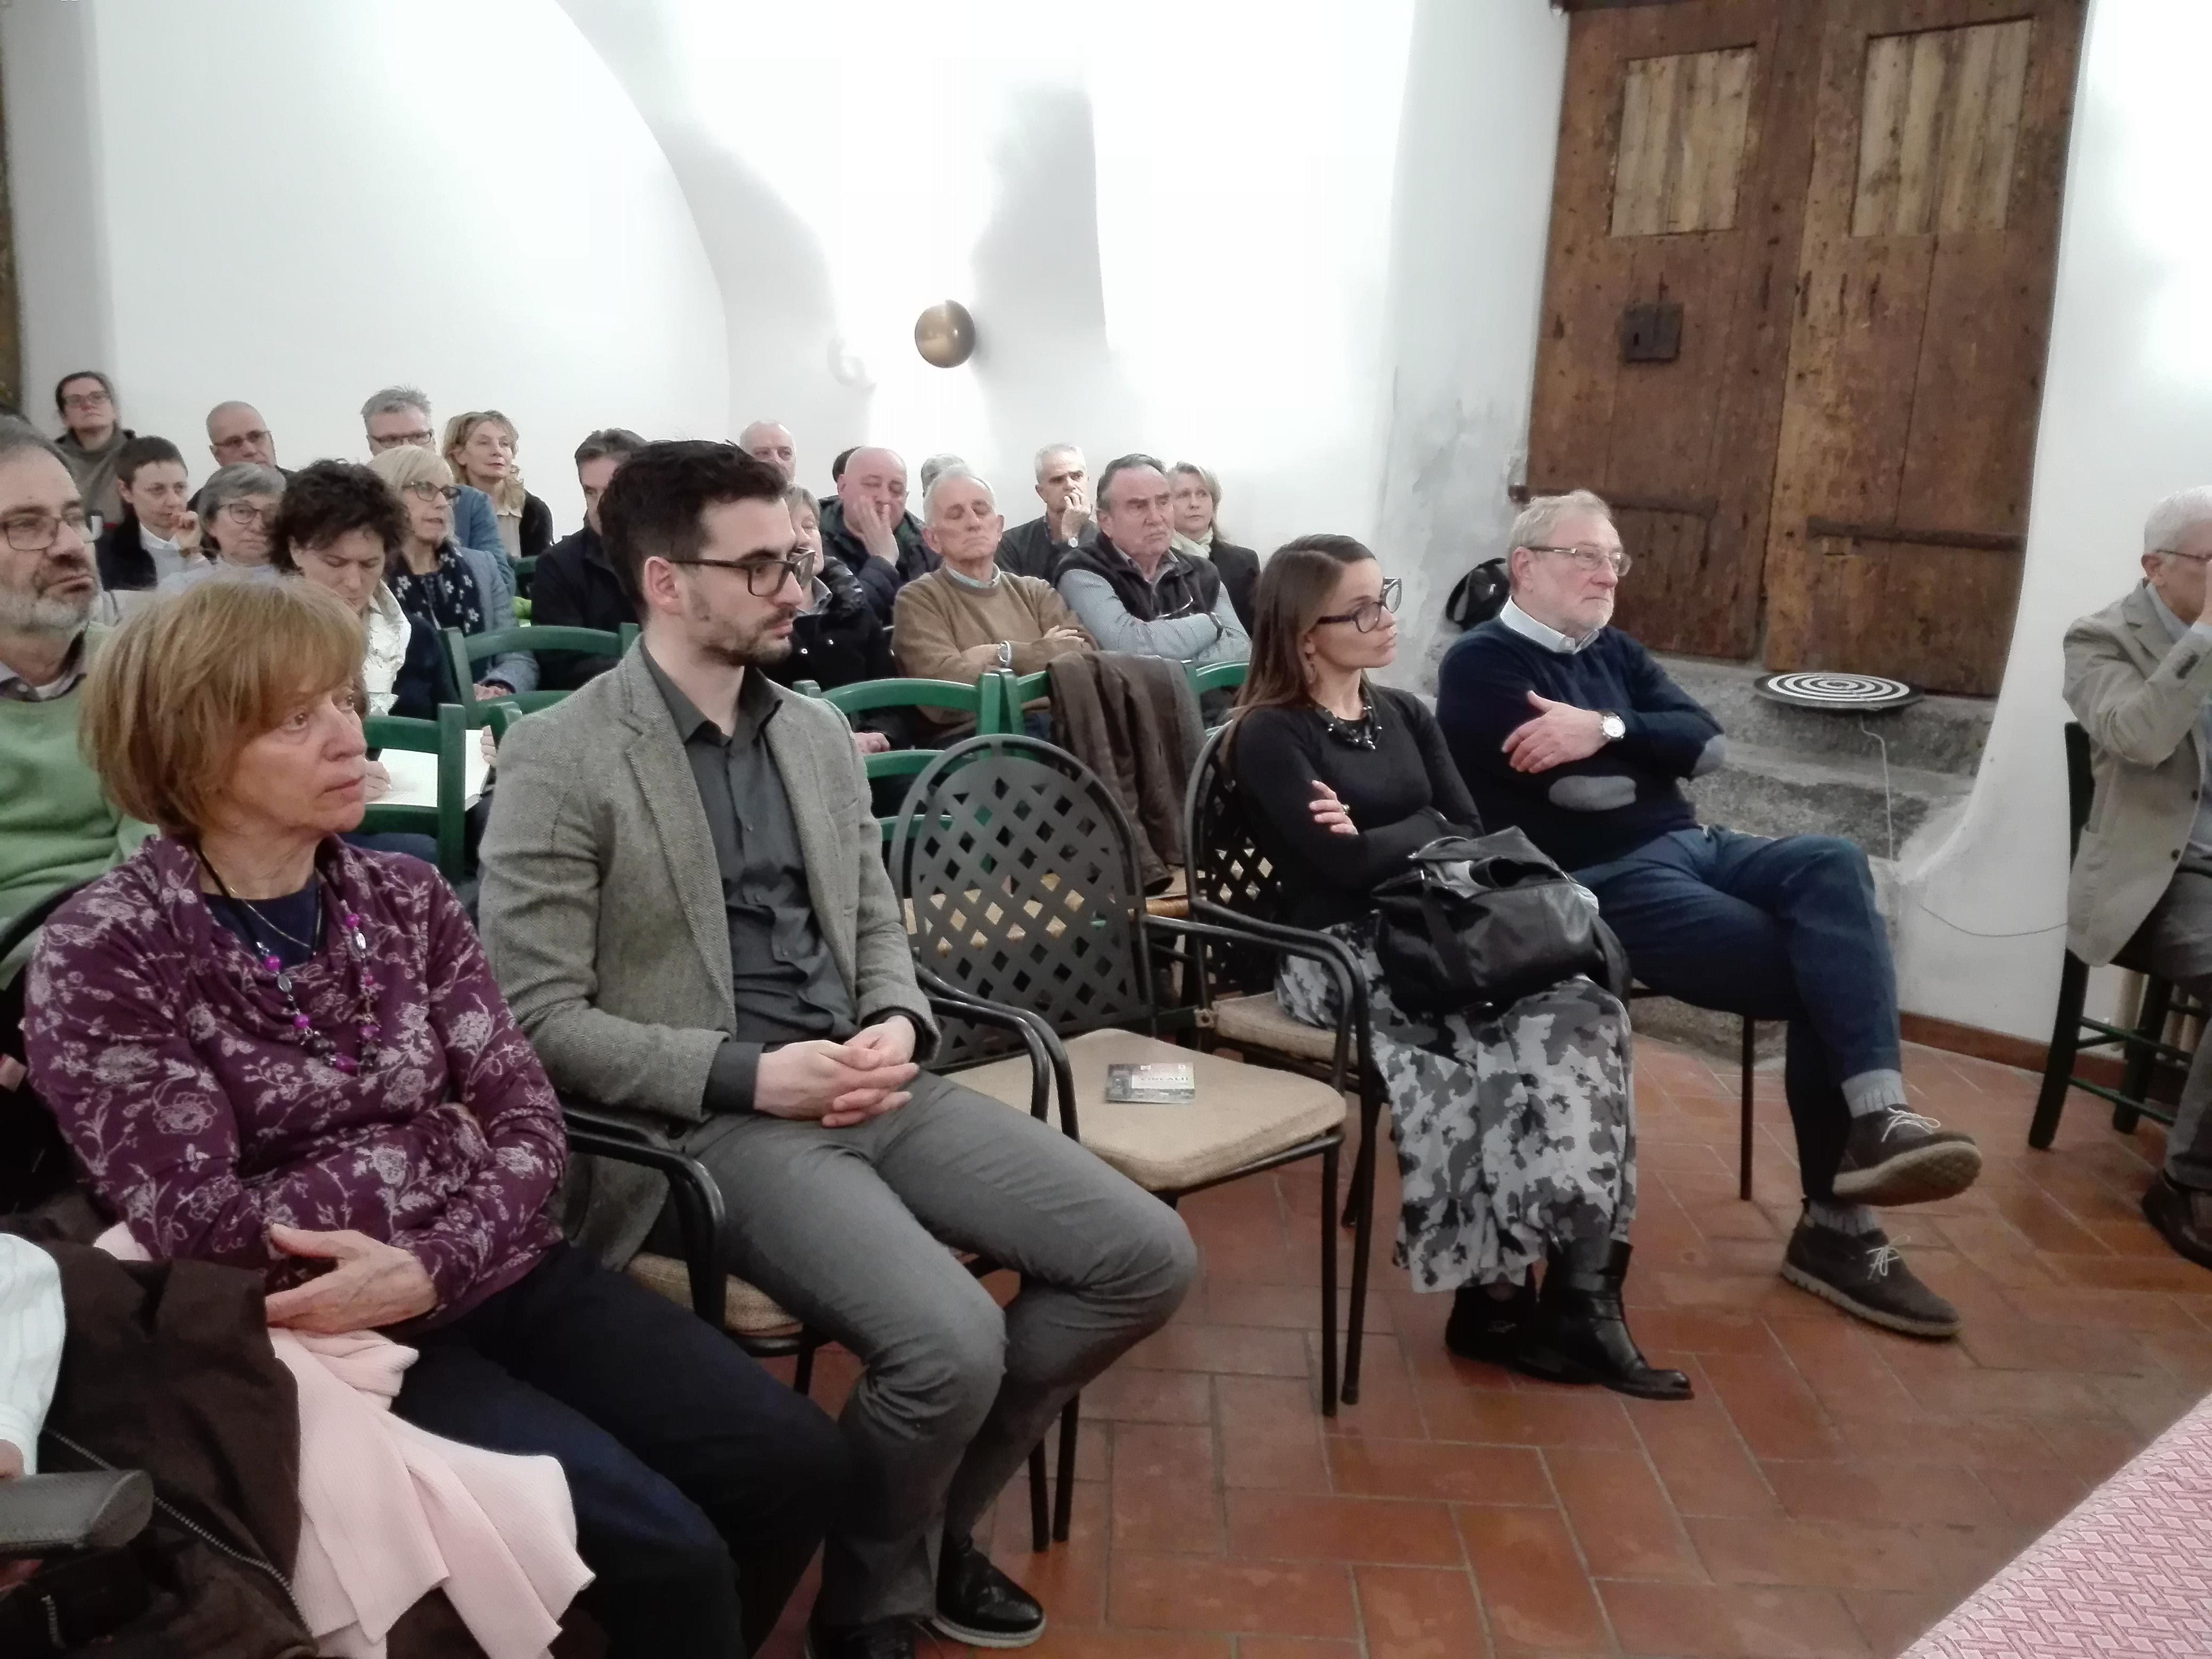 52_assemblea ghislandi 07-04-2018